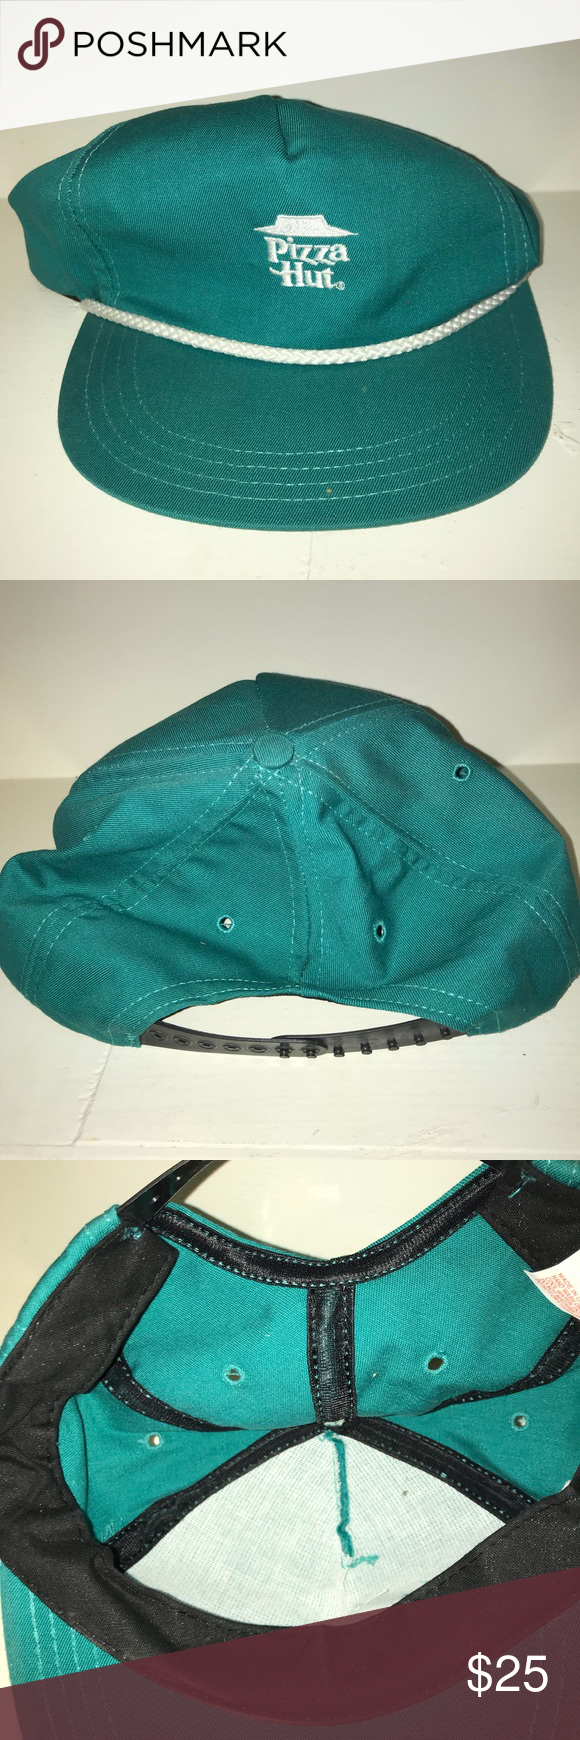 Vintage Pizza Hut Snapback Rope Hat Hats Crochet Bikini Pizza Hut